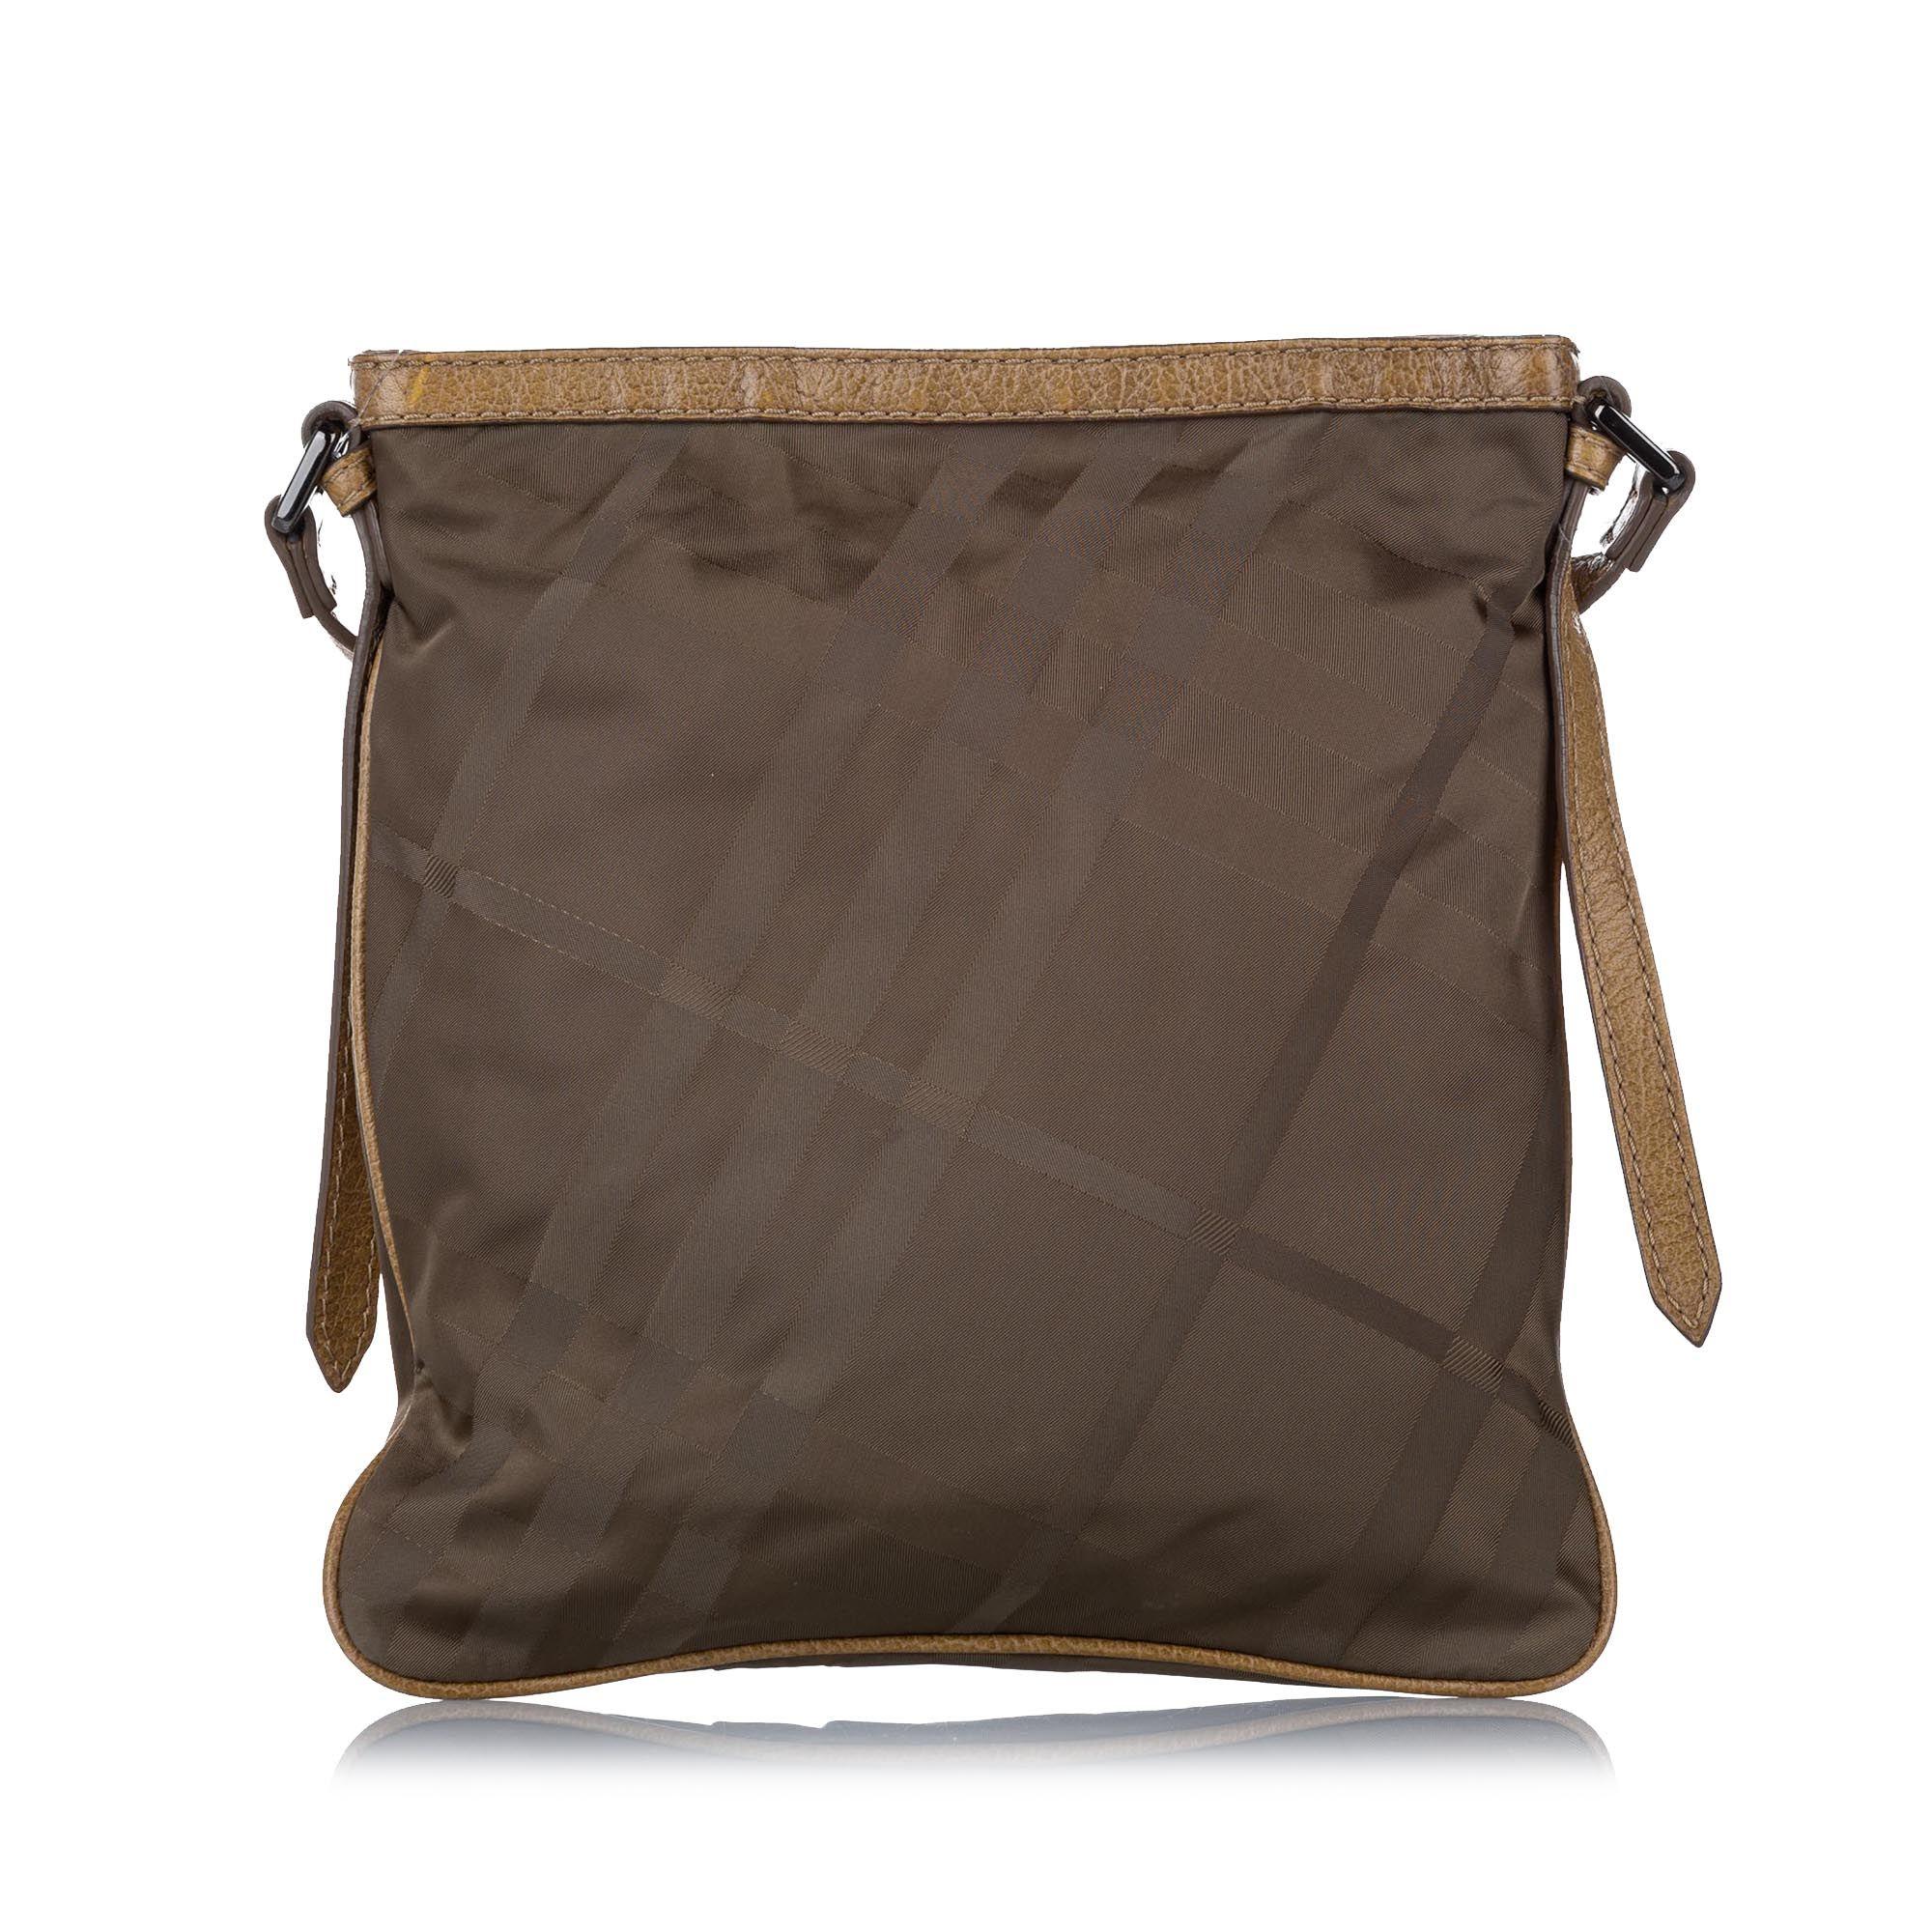 Vintage Burberry Plaid Canvas Crossbody Bag Brown